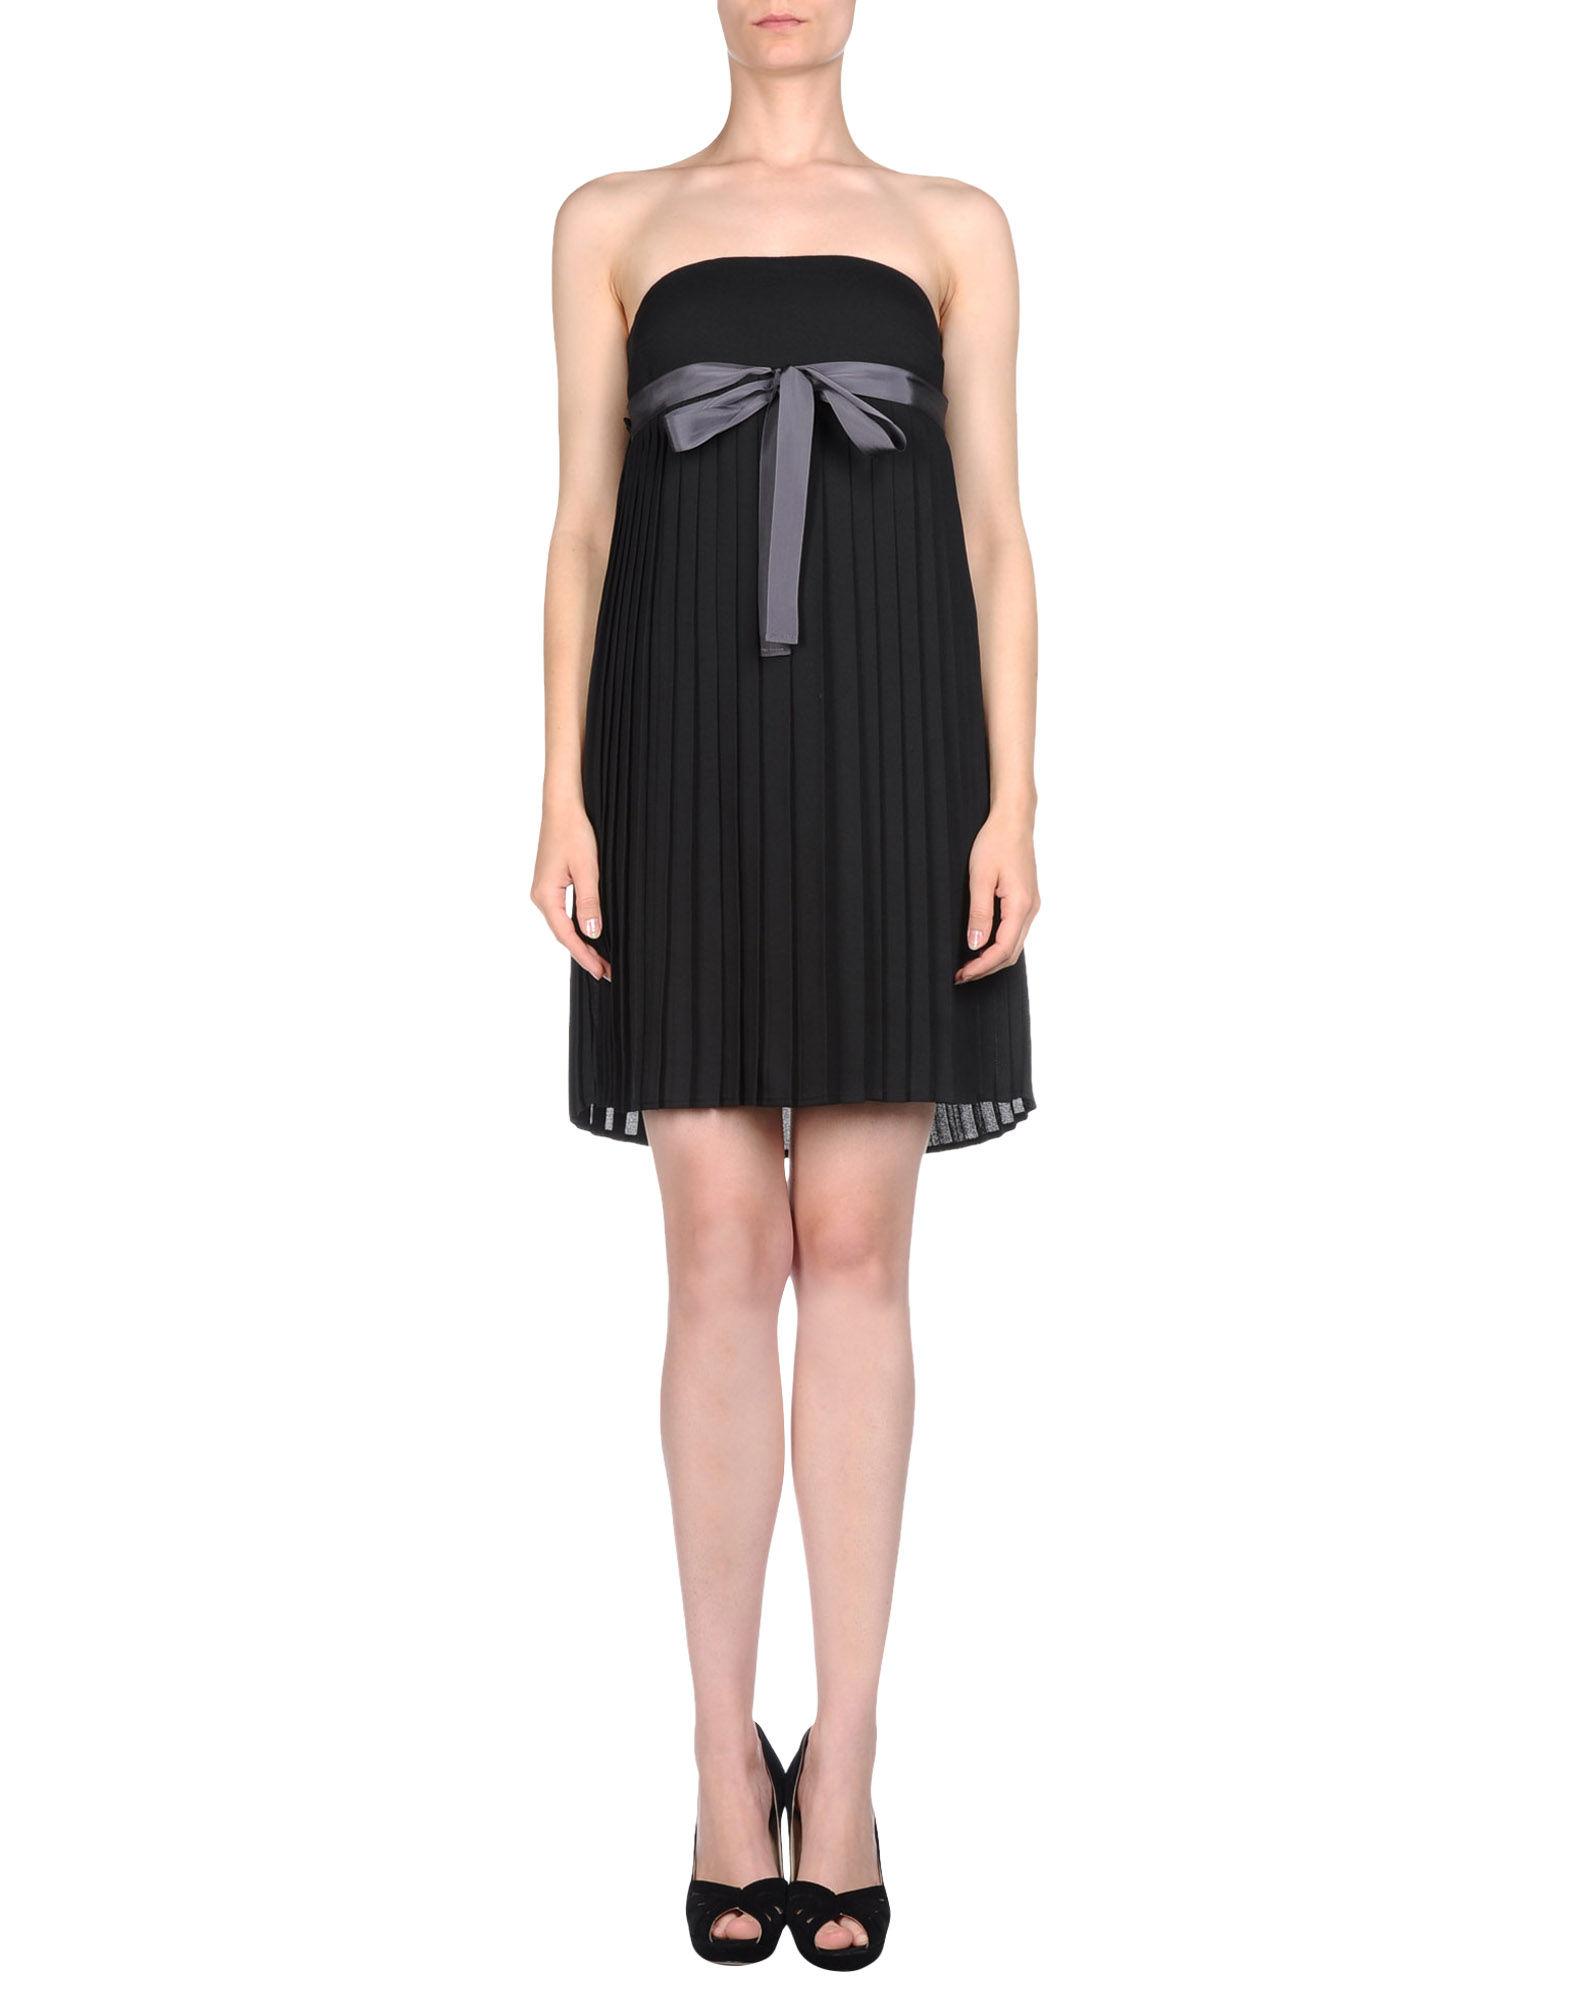 JUCCA Короткое платье прилегающее платье со складками monica прилегающее платье со складками